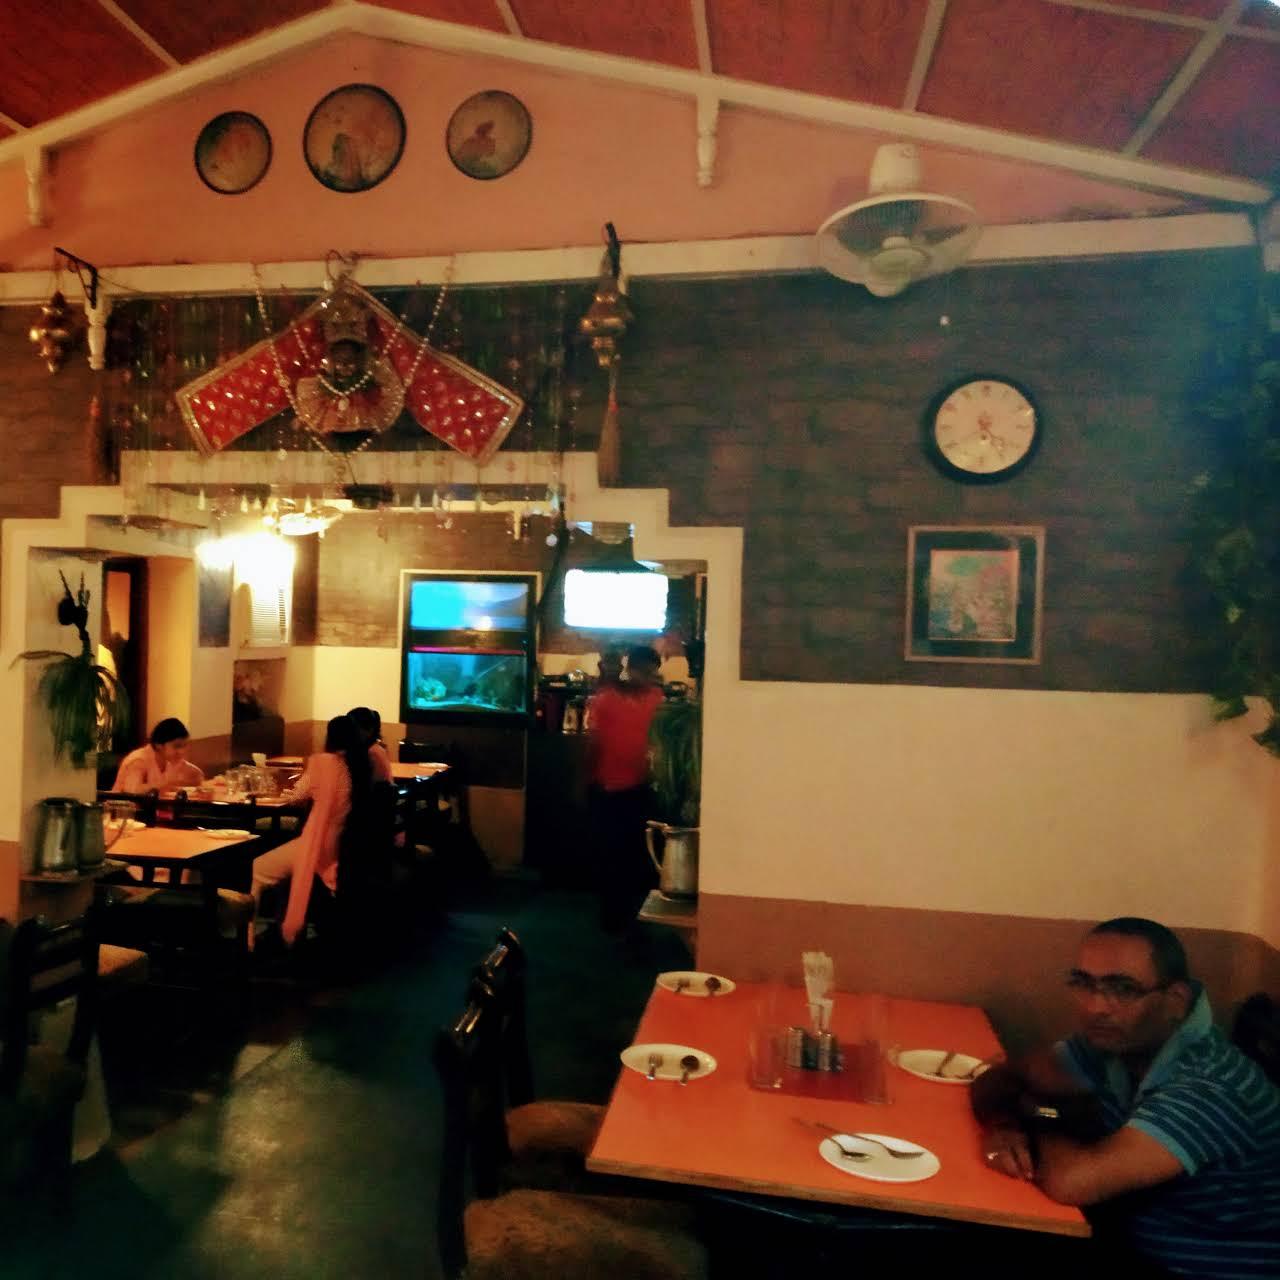 Restaurant In Cuttack That One Must Try-Barabati Restaurant